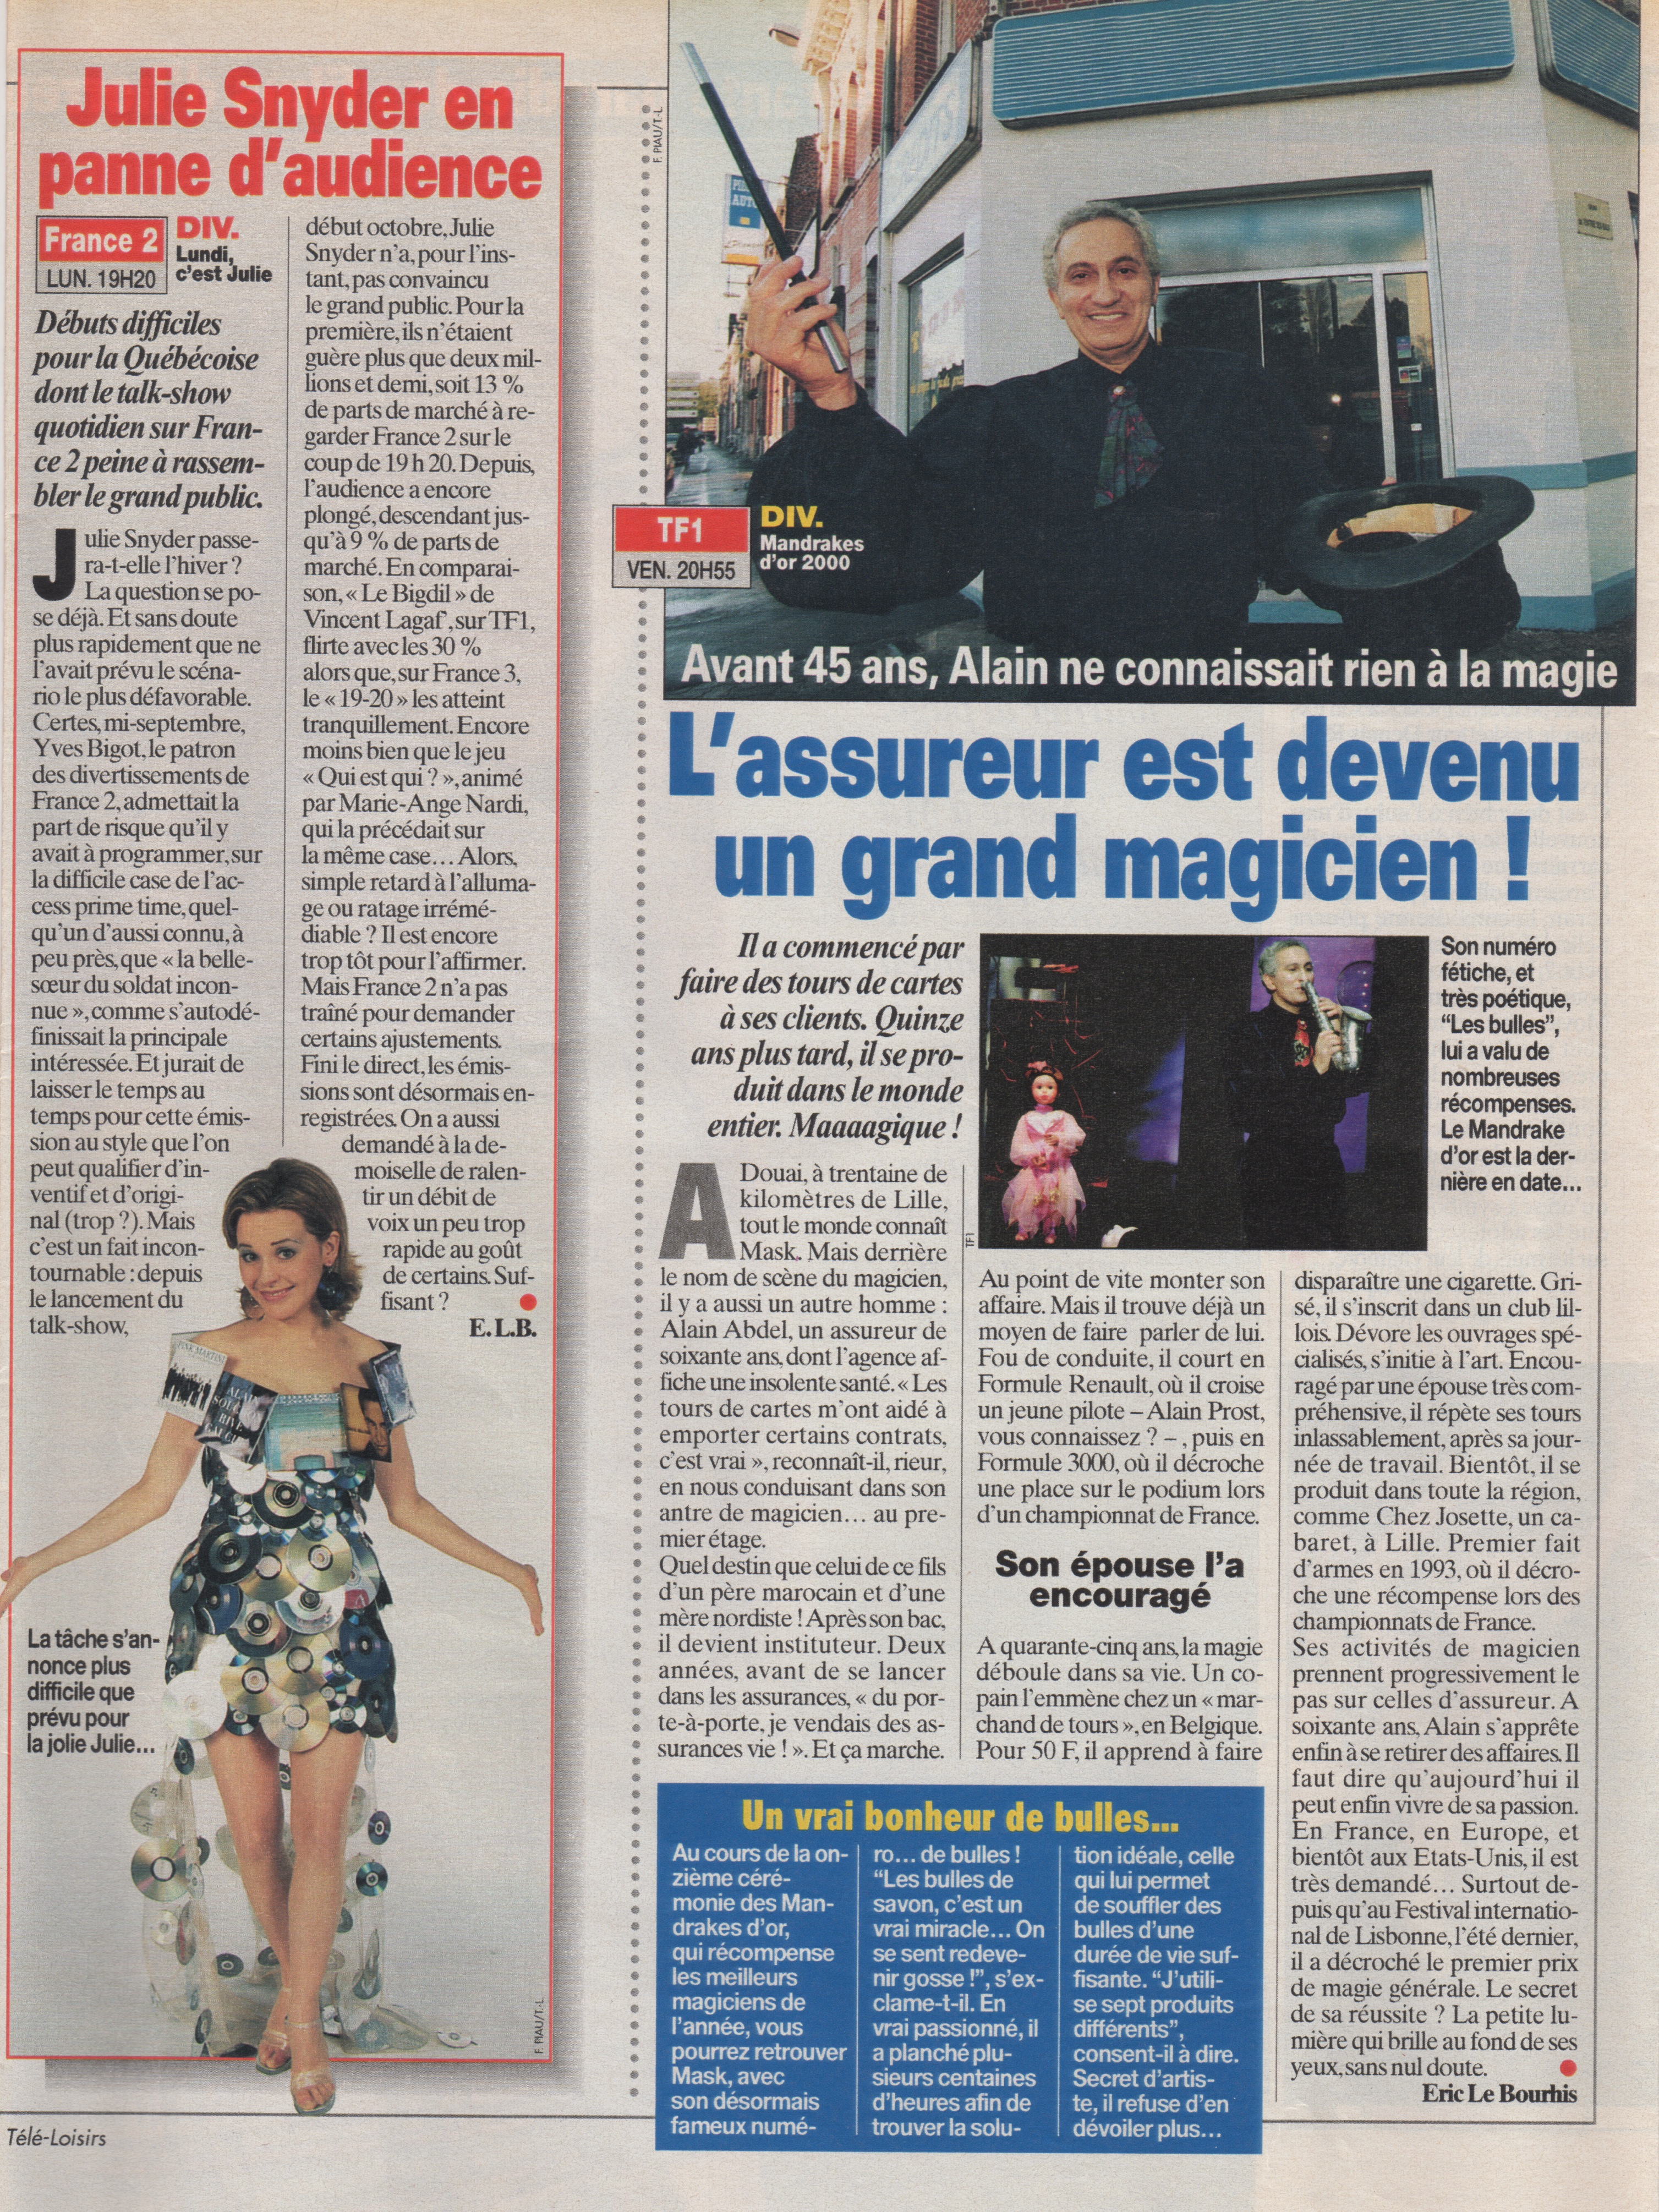 Télé Loisir Novembre 2000